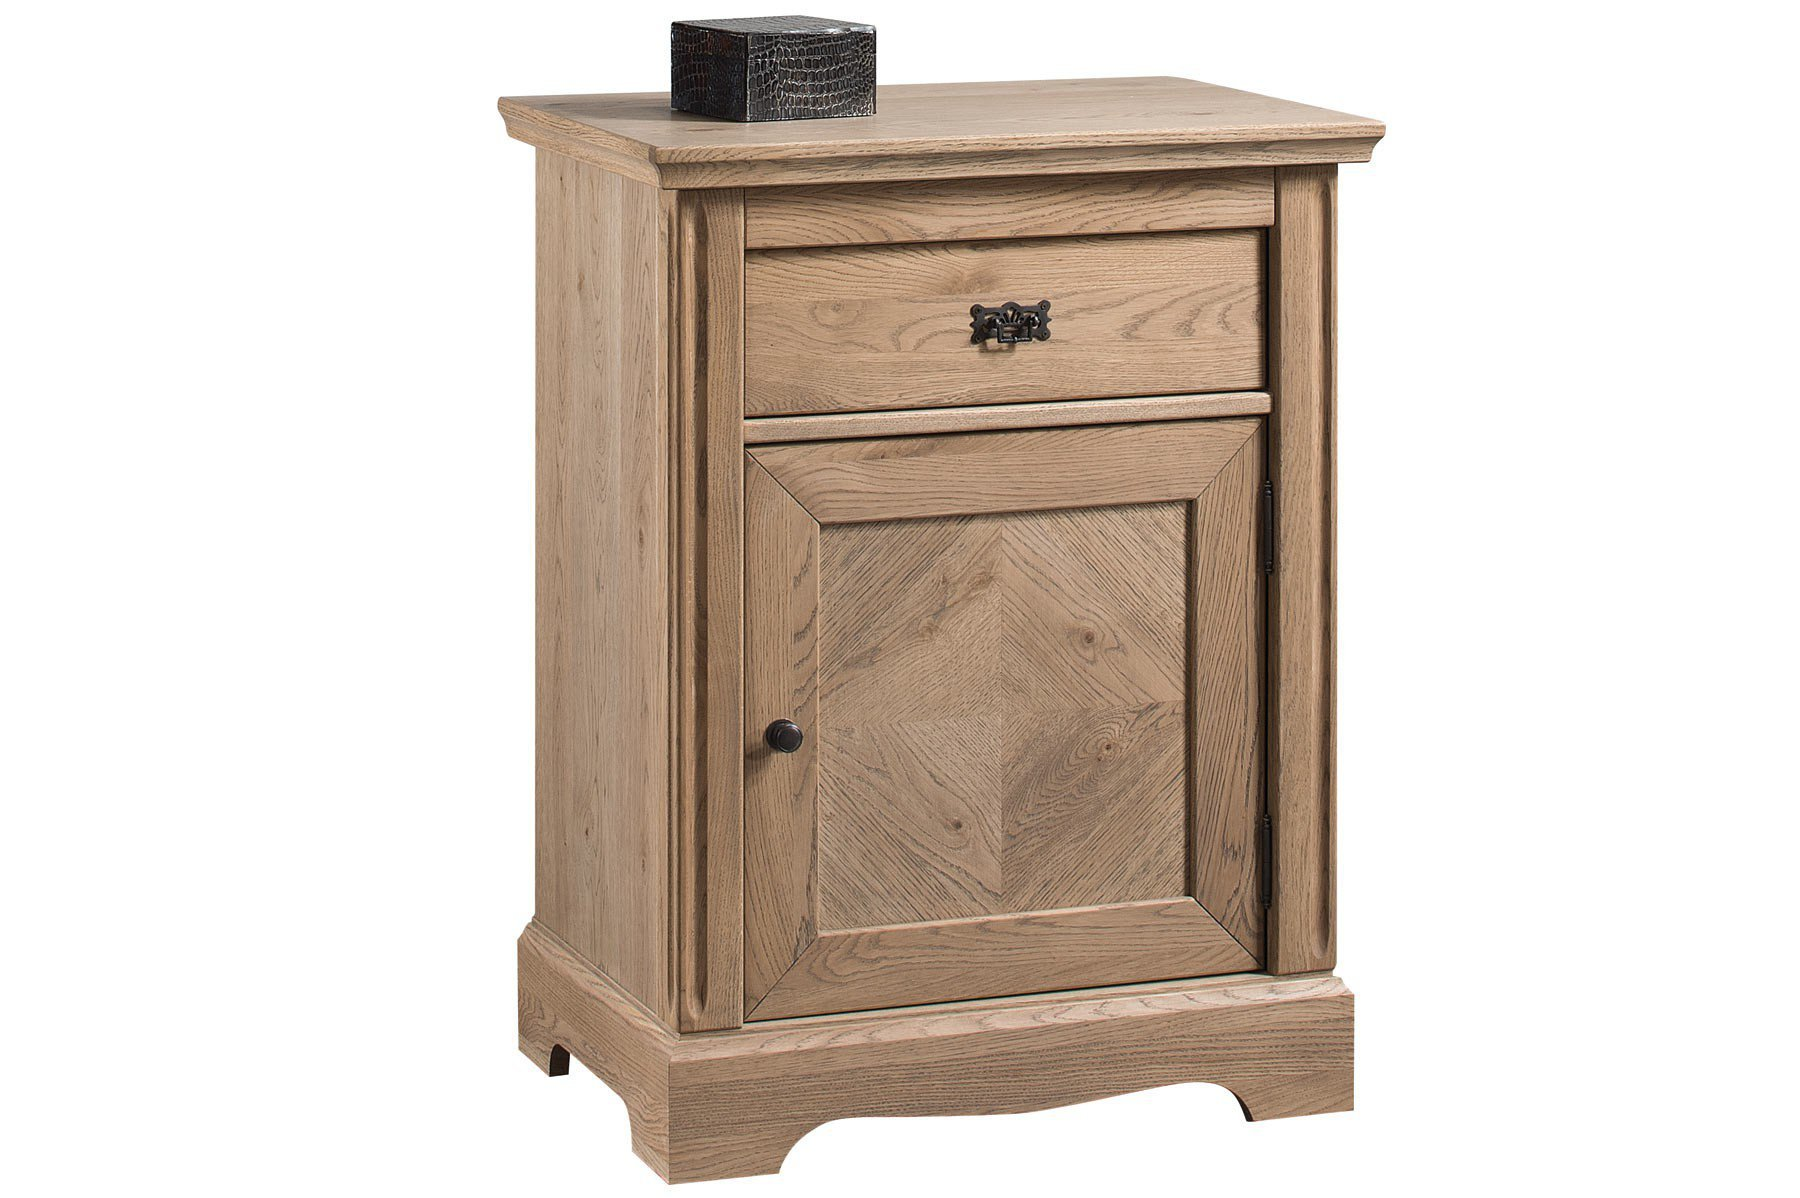 kollektion letz atelie kommode eiche alt m bel letz ihr online shop. Black Bedroom Furniture Sets. Home Design Ideas